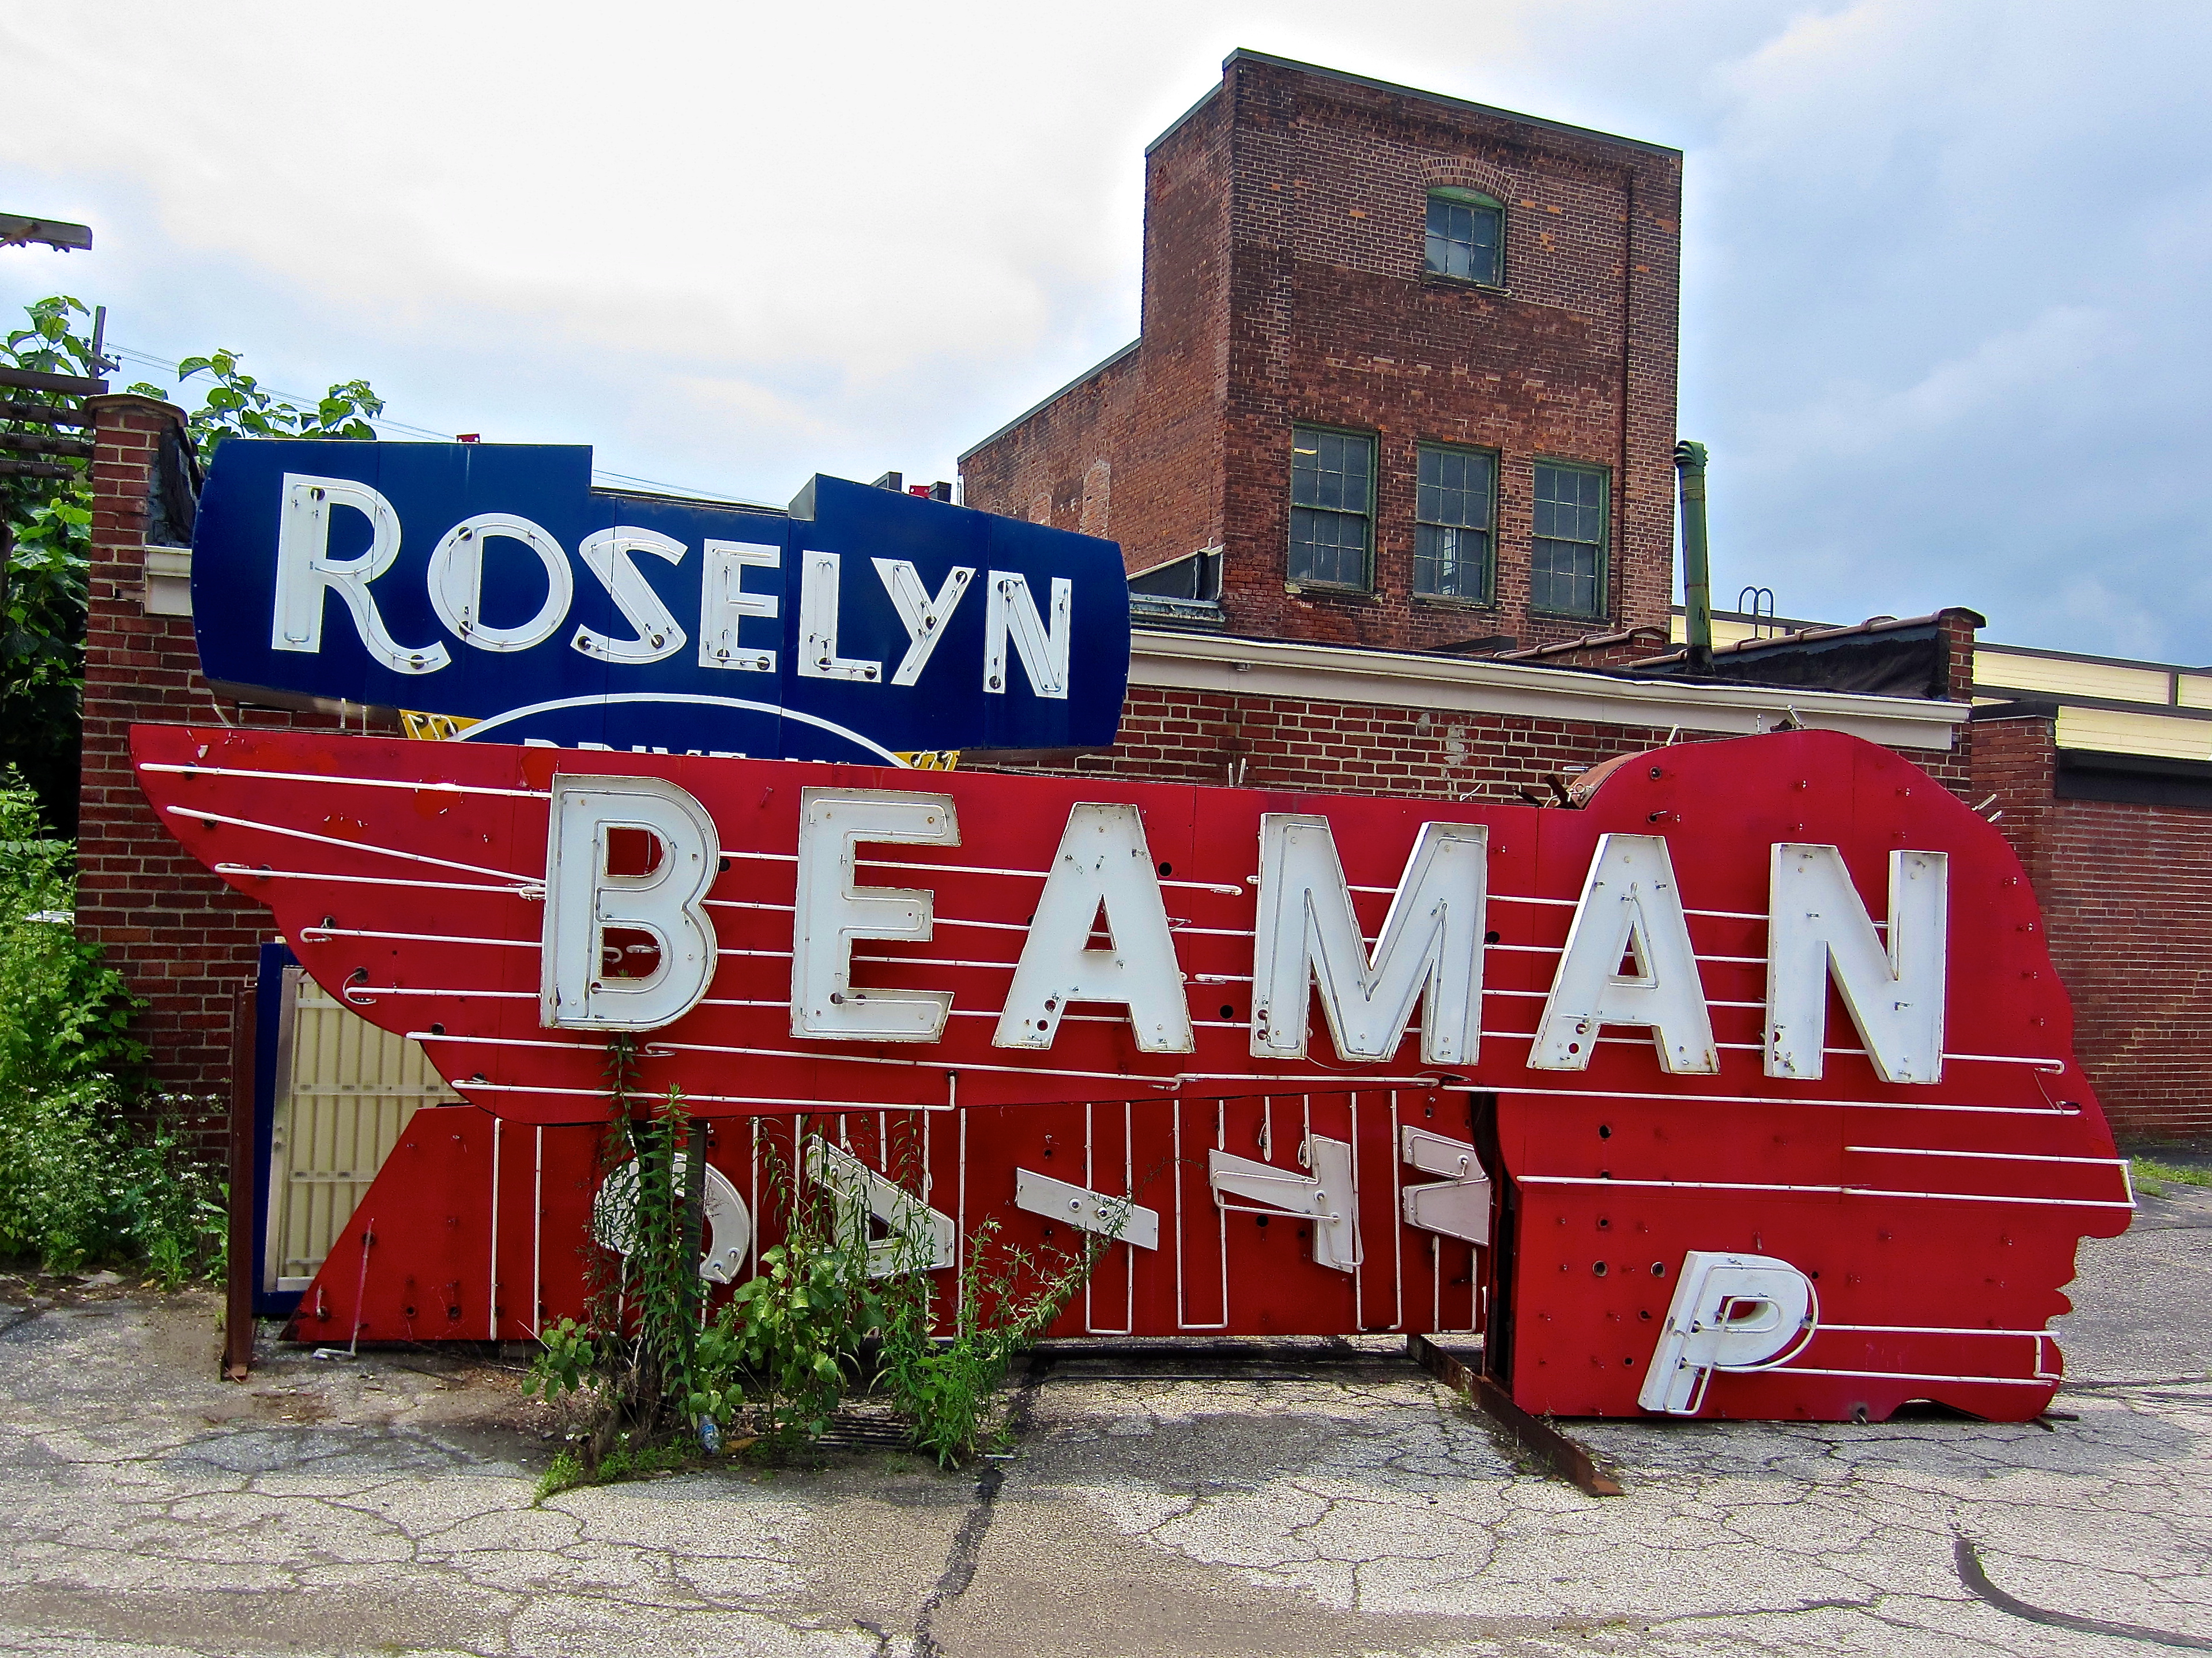 Beaman Pontiac sign - American Sign Museum - 1330 Monmouth Avenue, Cincinnati, Ohio U.S.A. - July 2, 2015